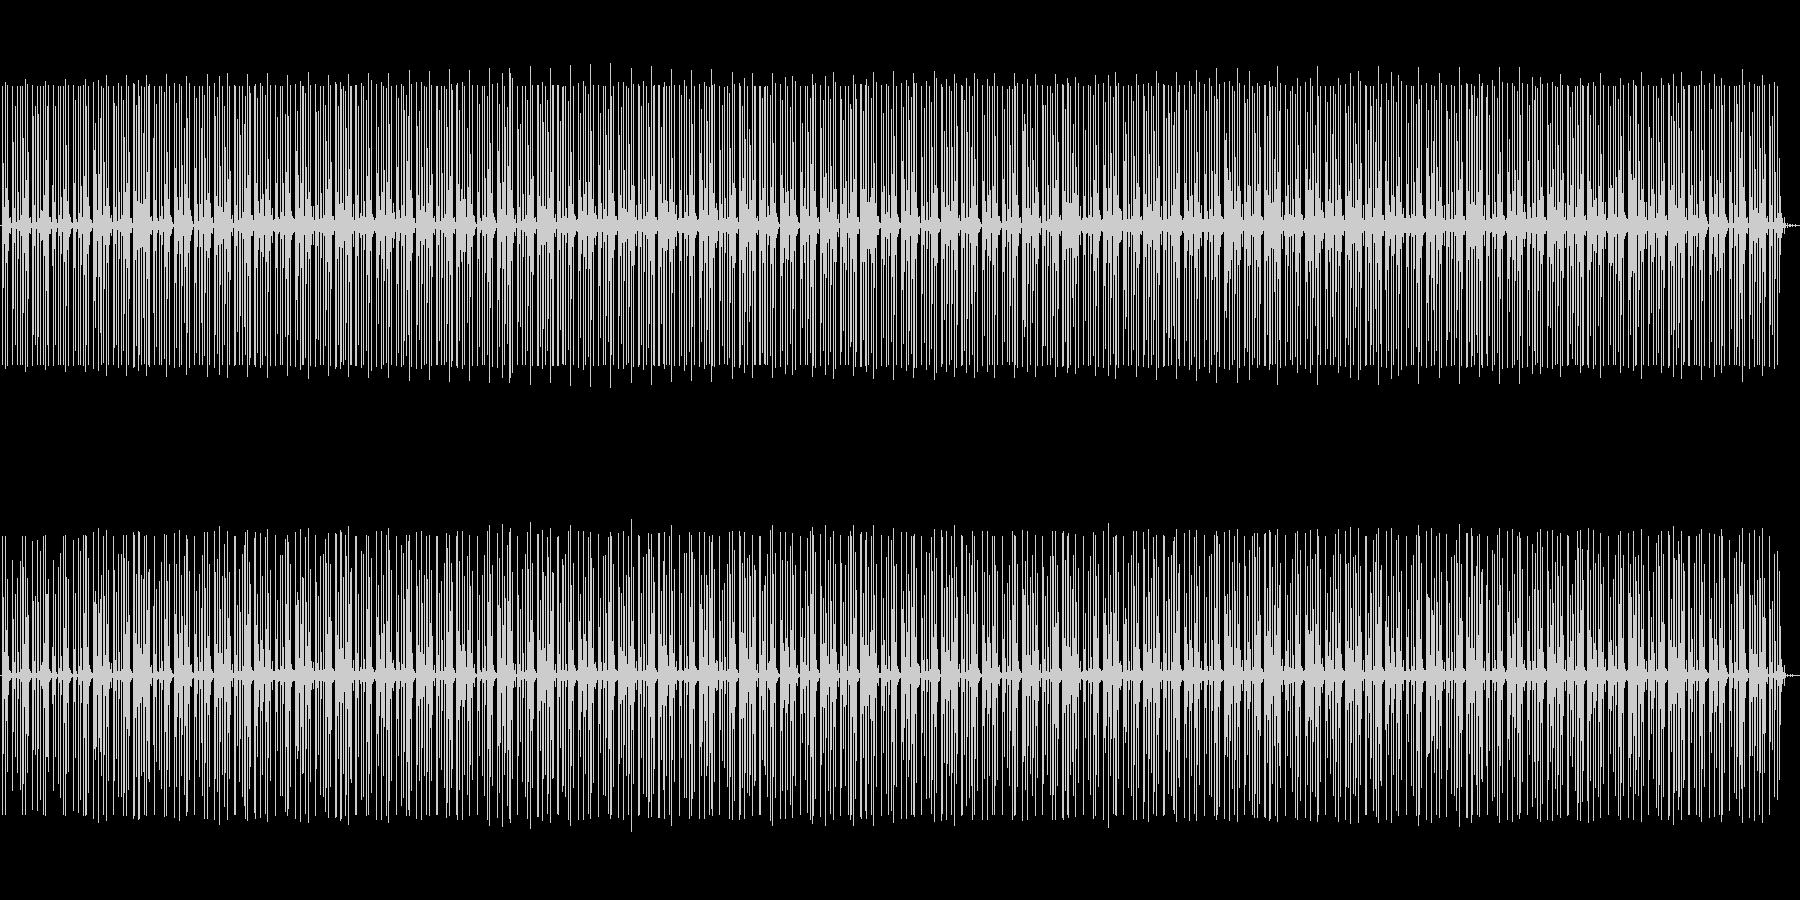 (˙꒳˙ᐢ)✋会話の邪魔にならない曲✋の未再生の波形